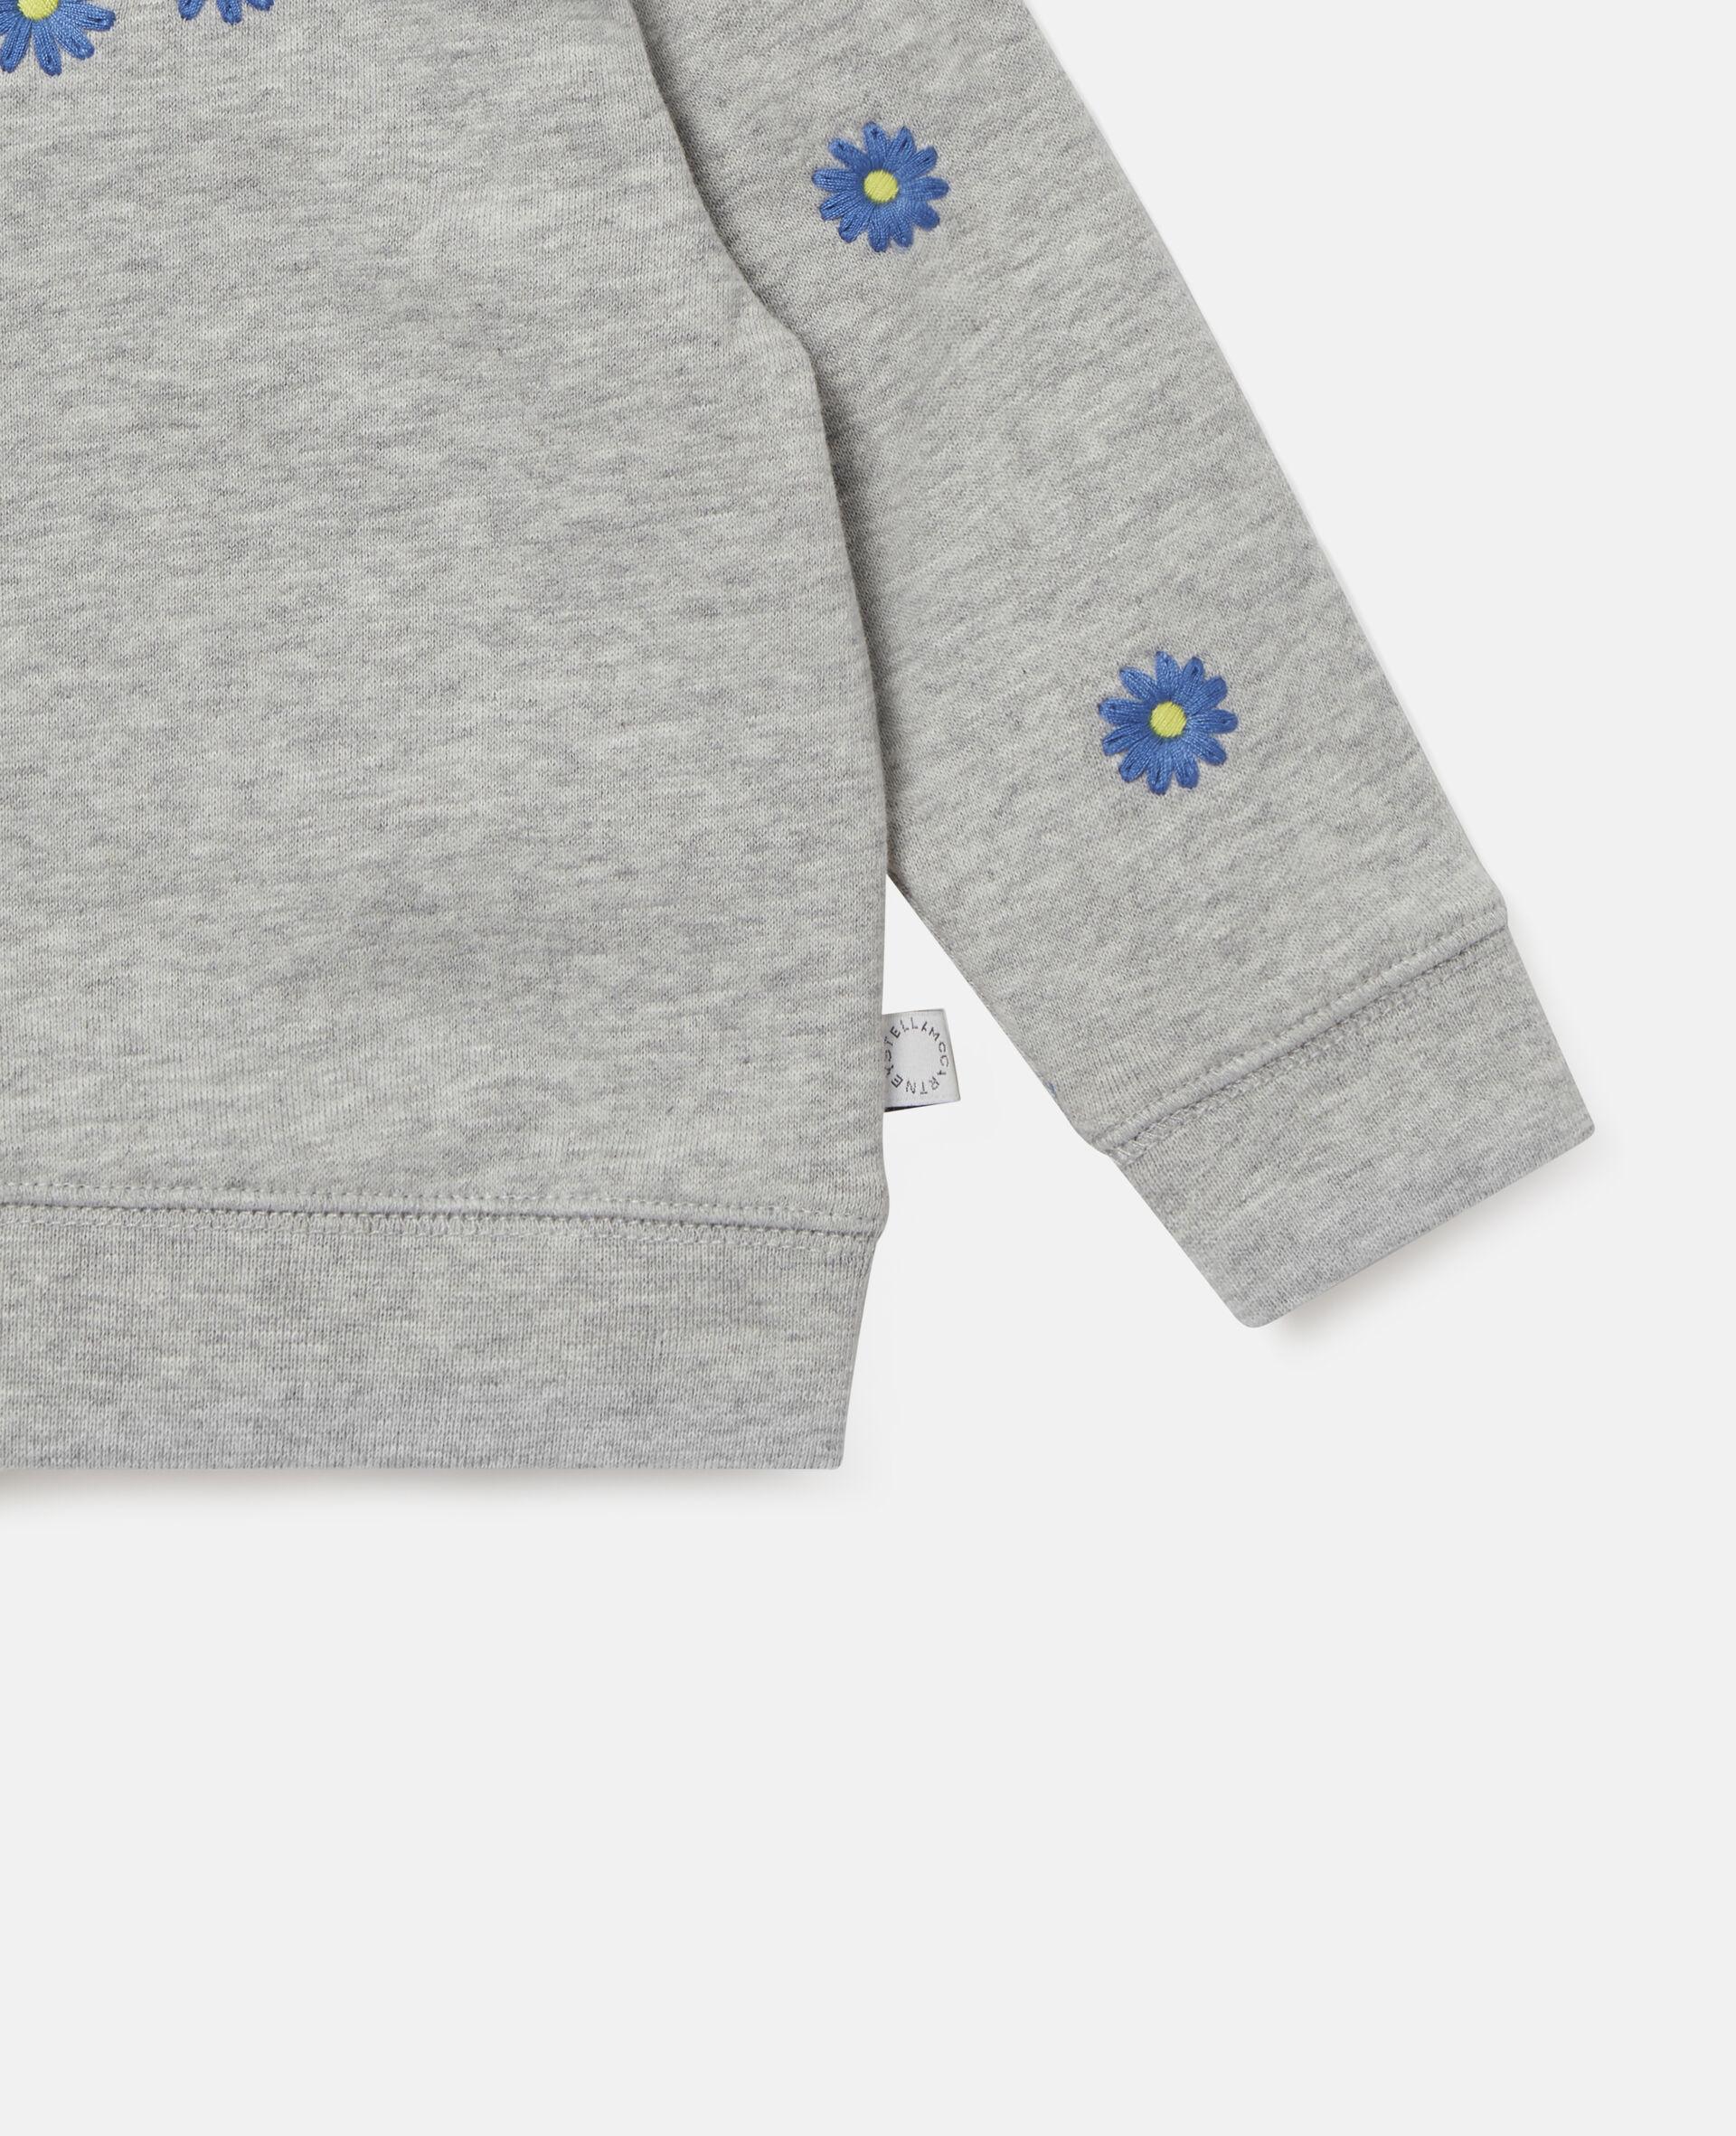 Embroidered Daisies Fleece Sweatshirt -Grey-large image number 2